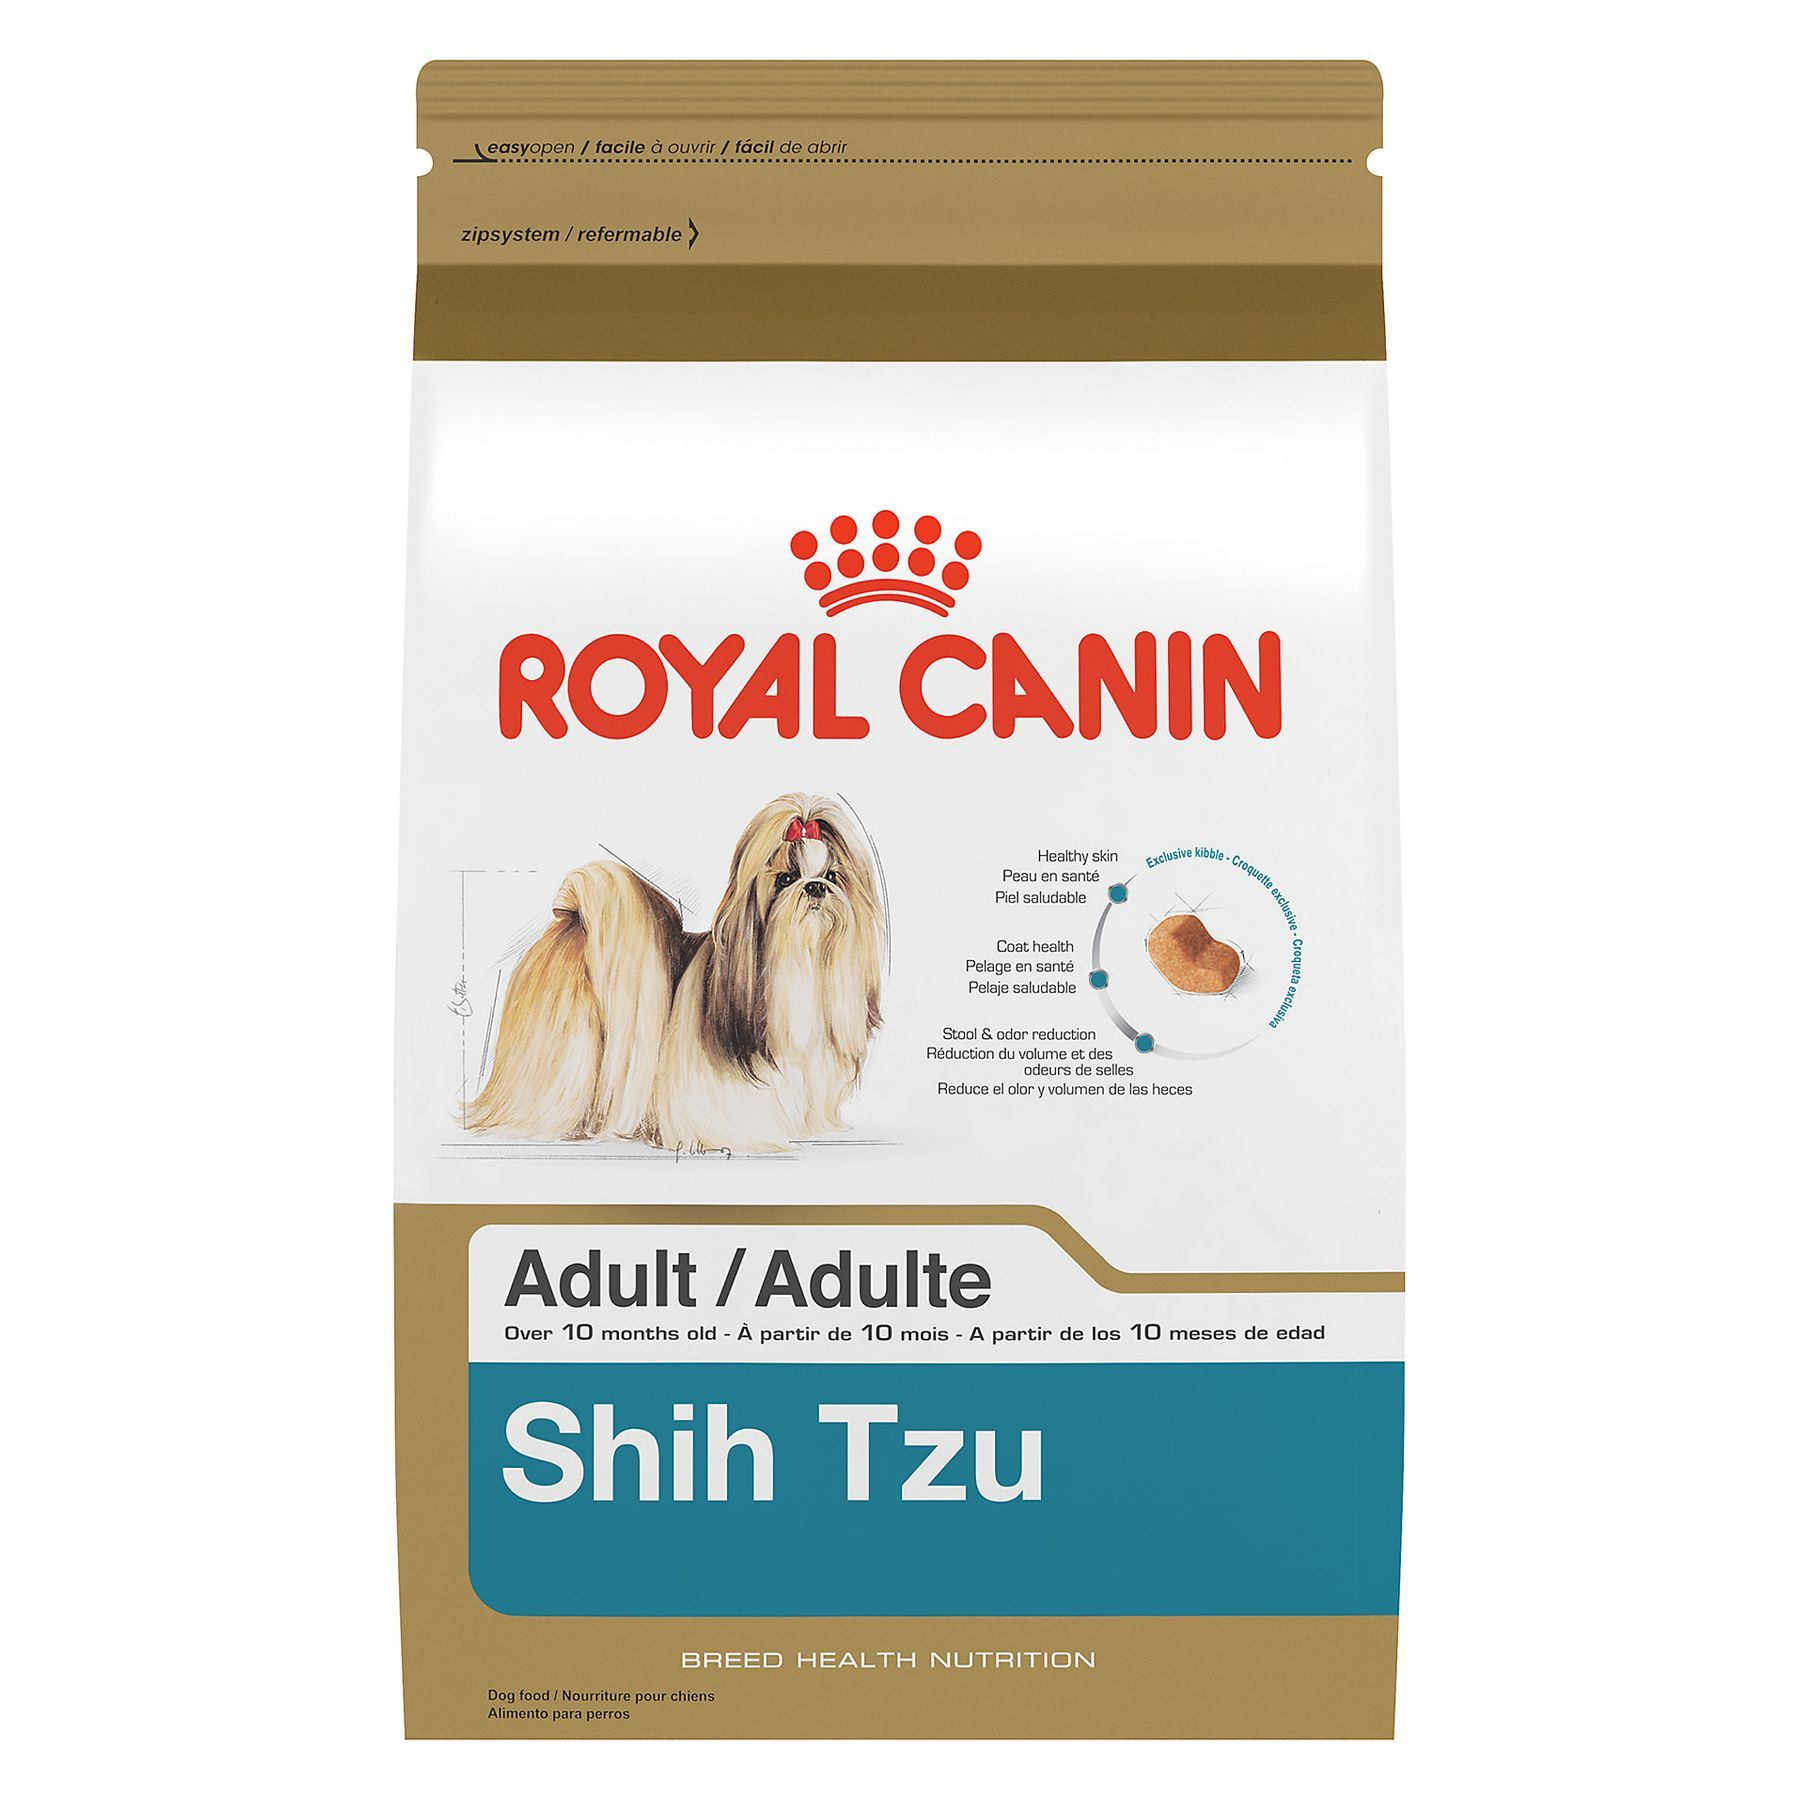 Royal Canin Breed Health Nutrition Shih Tzu Adult Dog Food Size